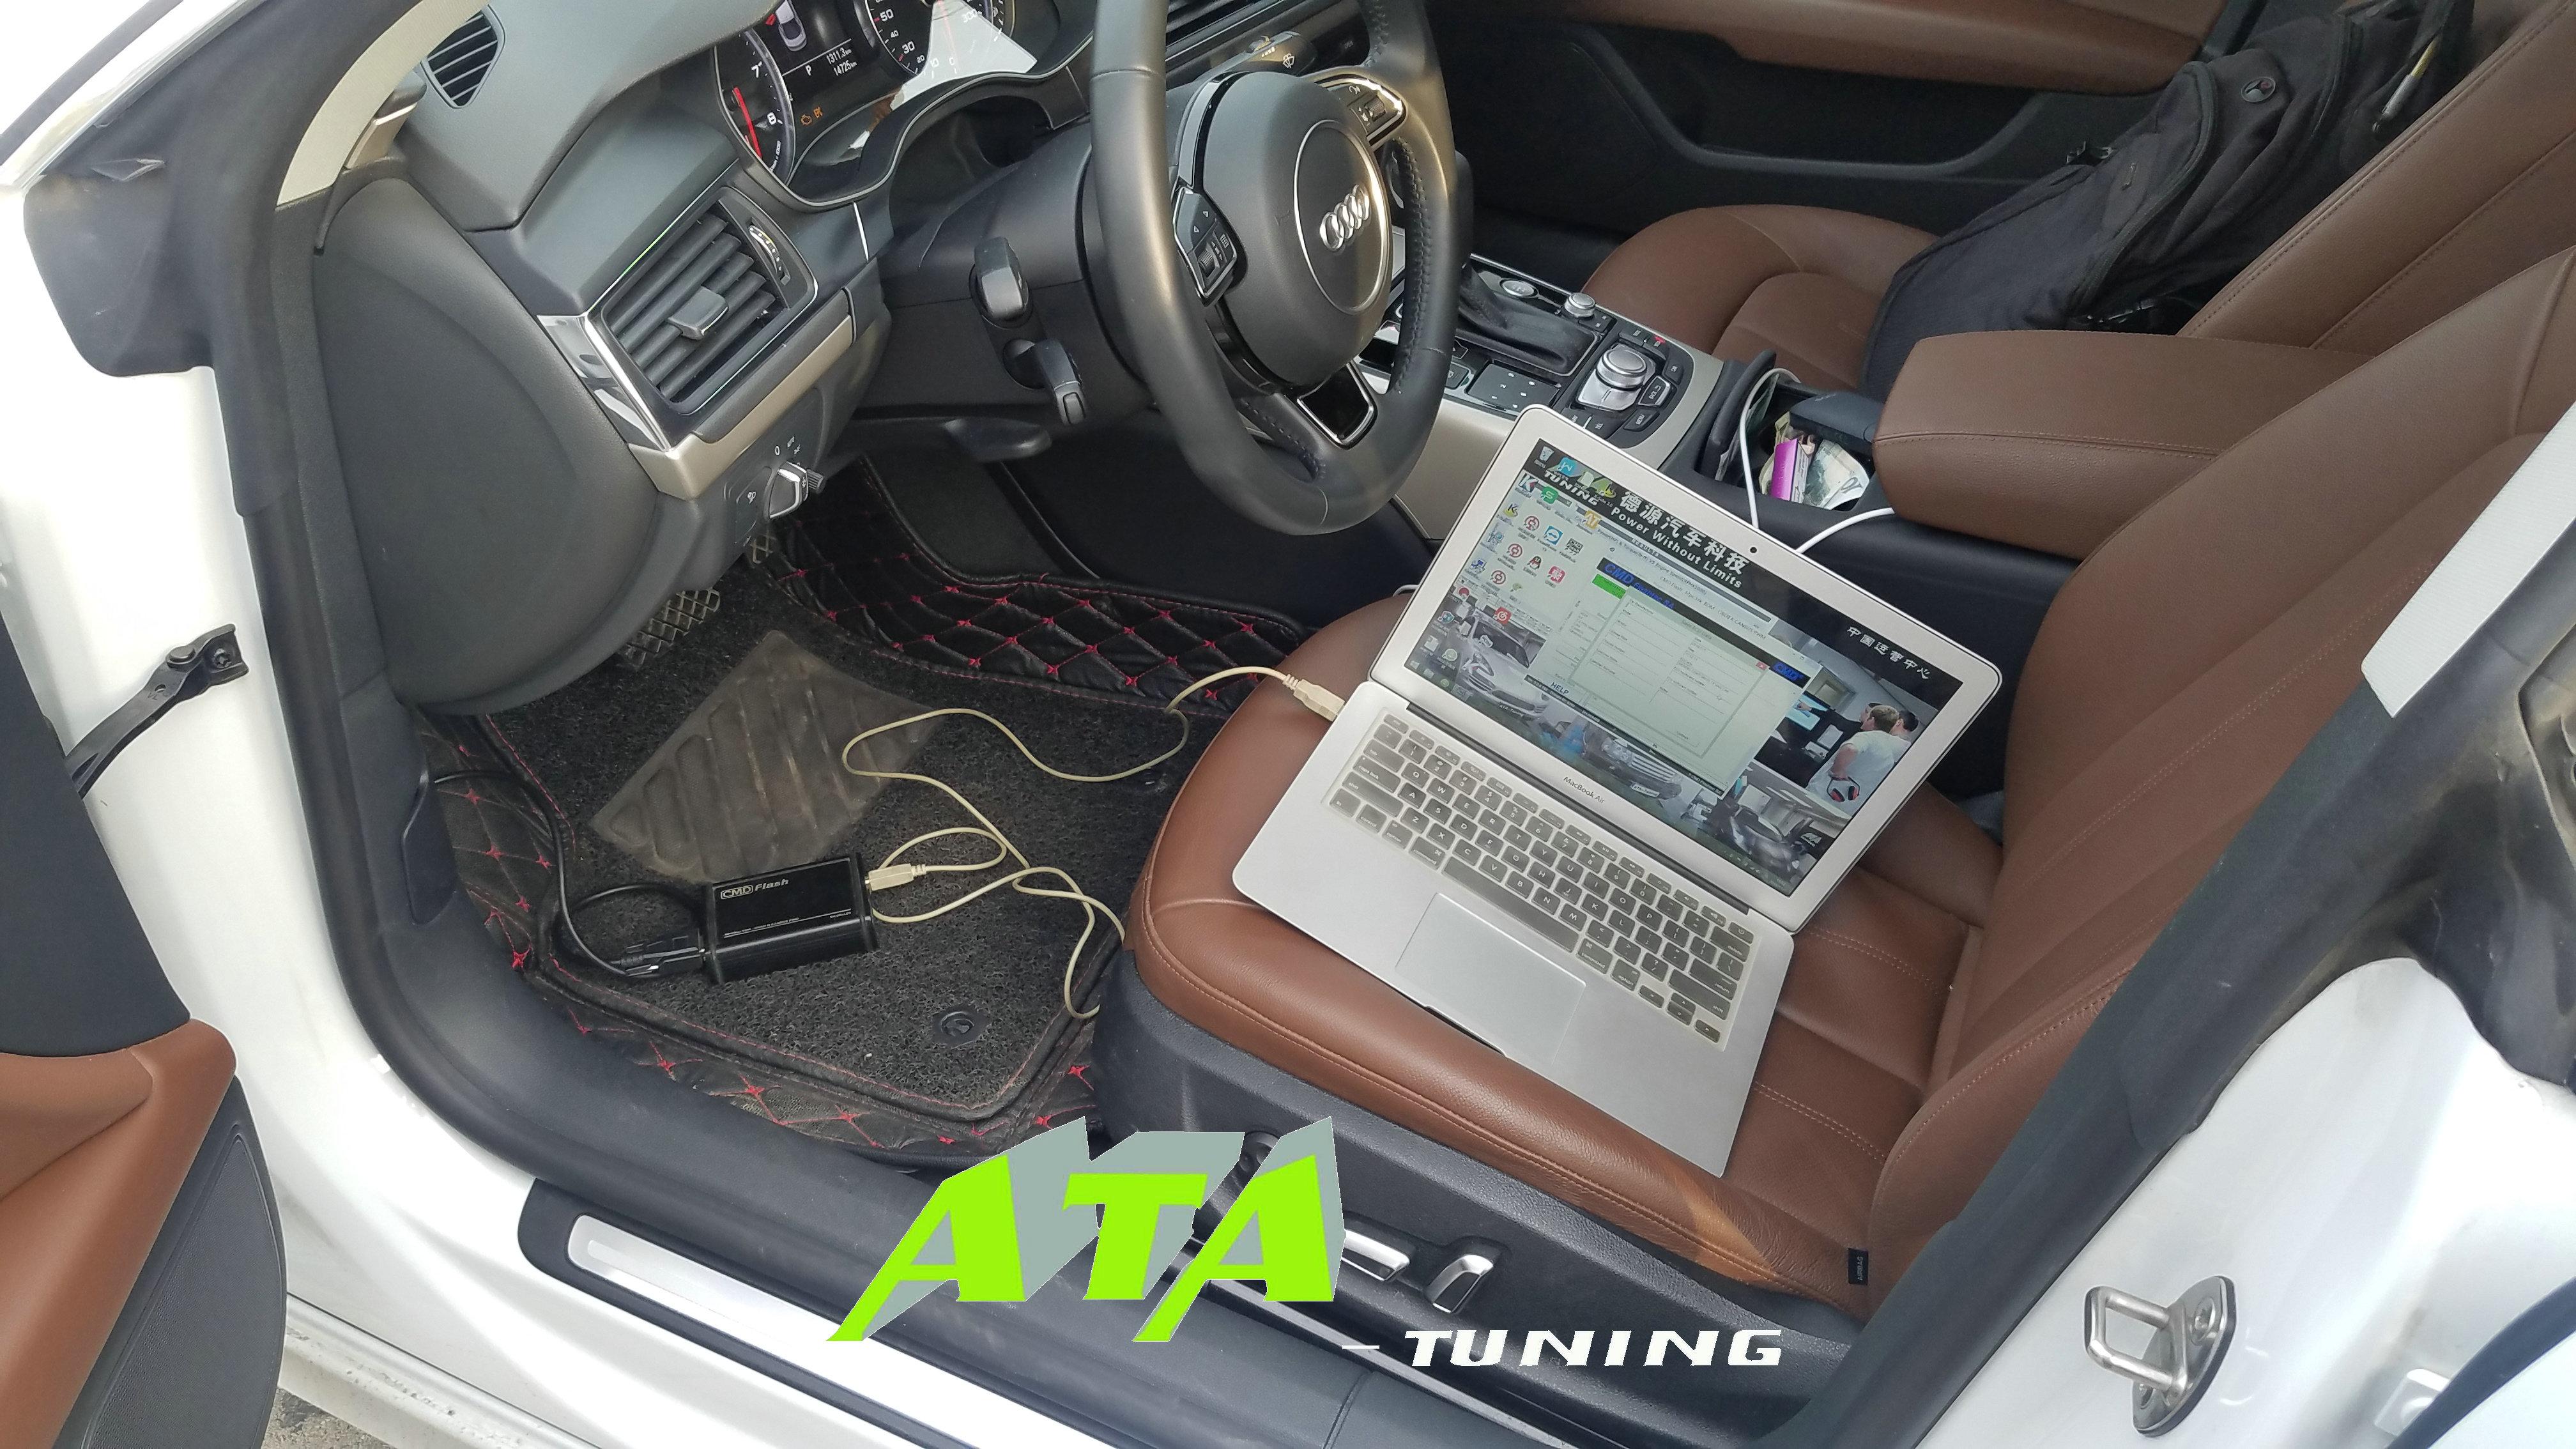 AUDI-A7 1.8T刷ECU,升级英国ATA-Tuning程序